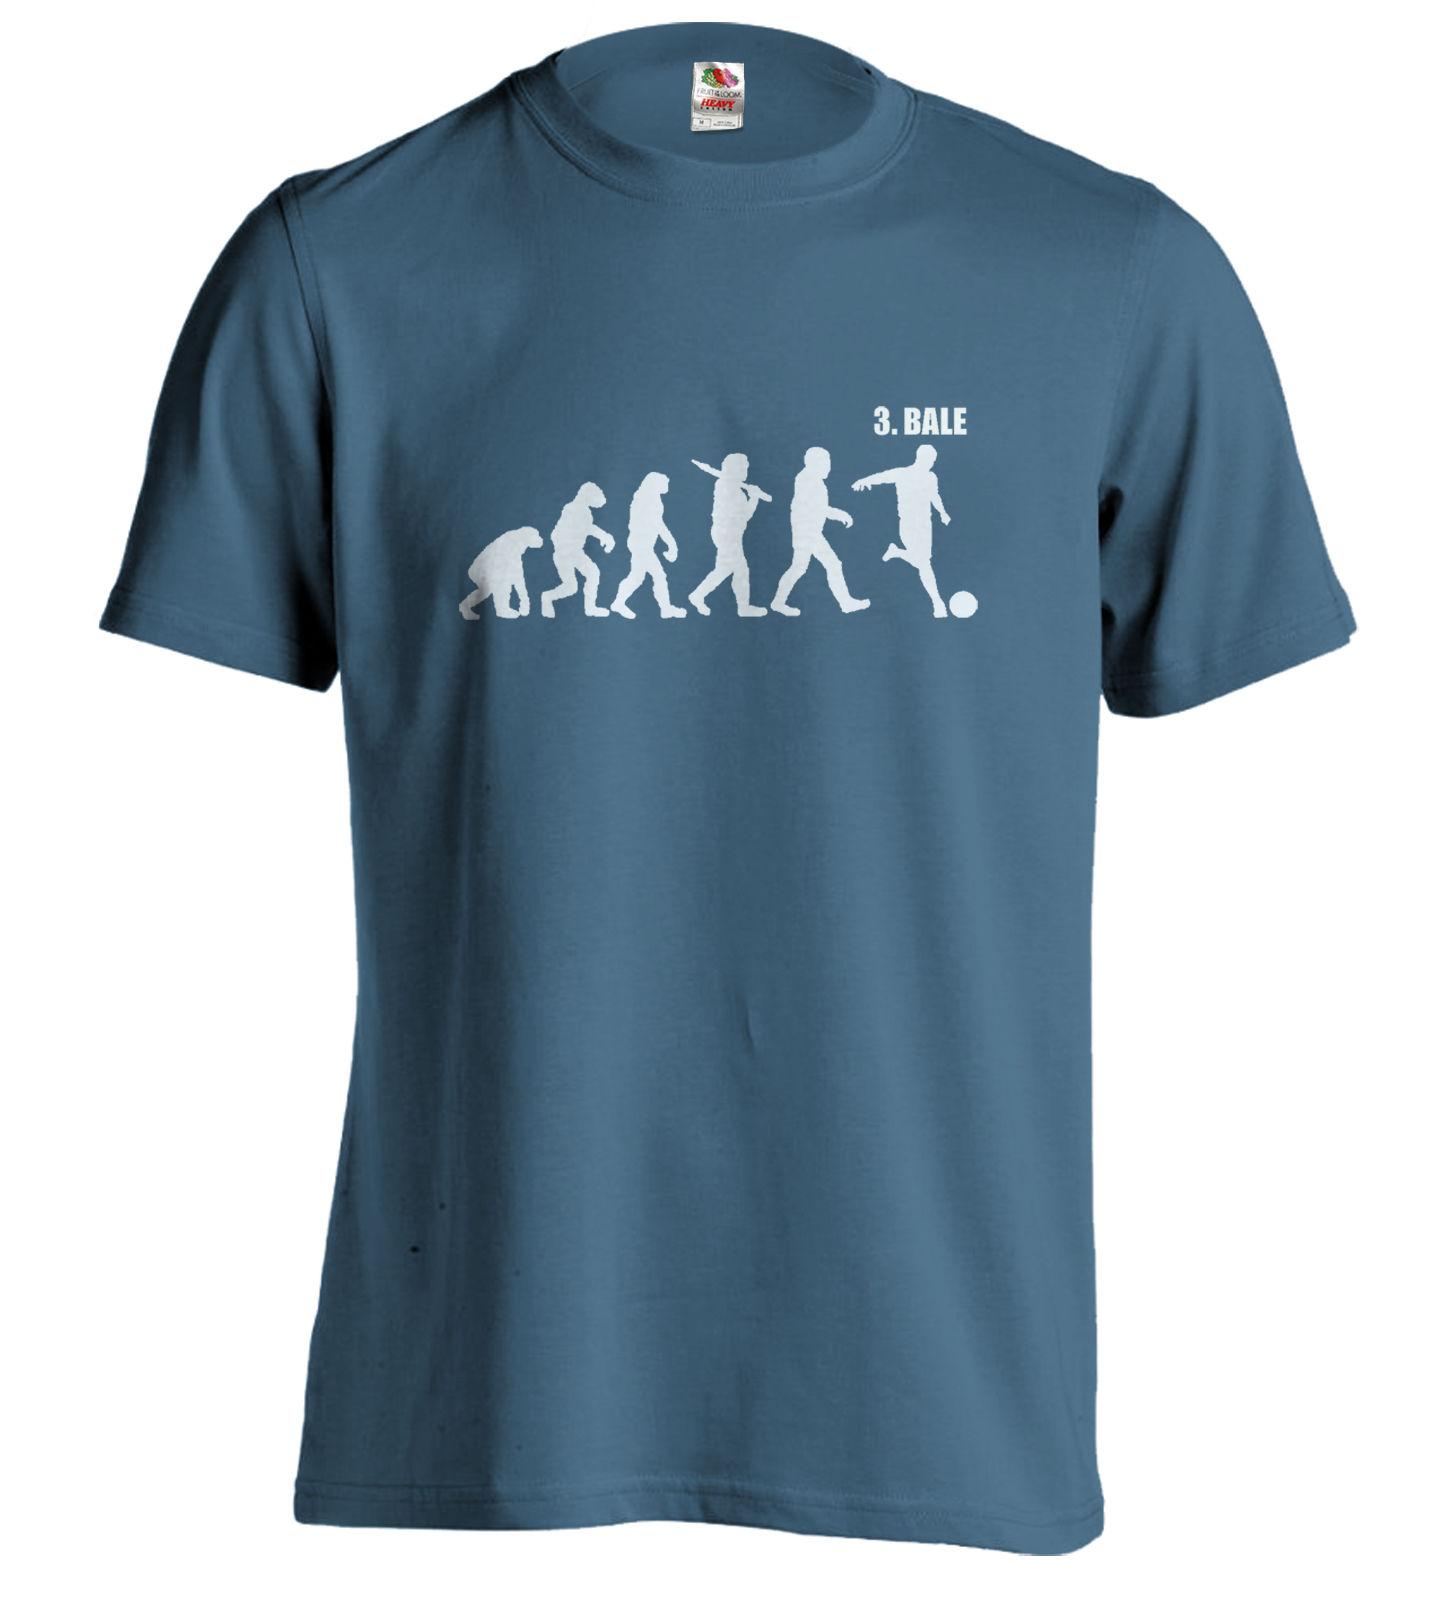 Gareth Bale Tee Spurs Evolution T-Shirt Funny T Footballer Evo Xmas Birthday Gift